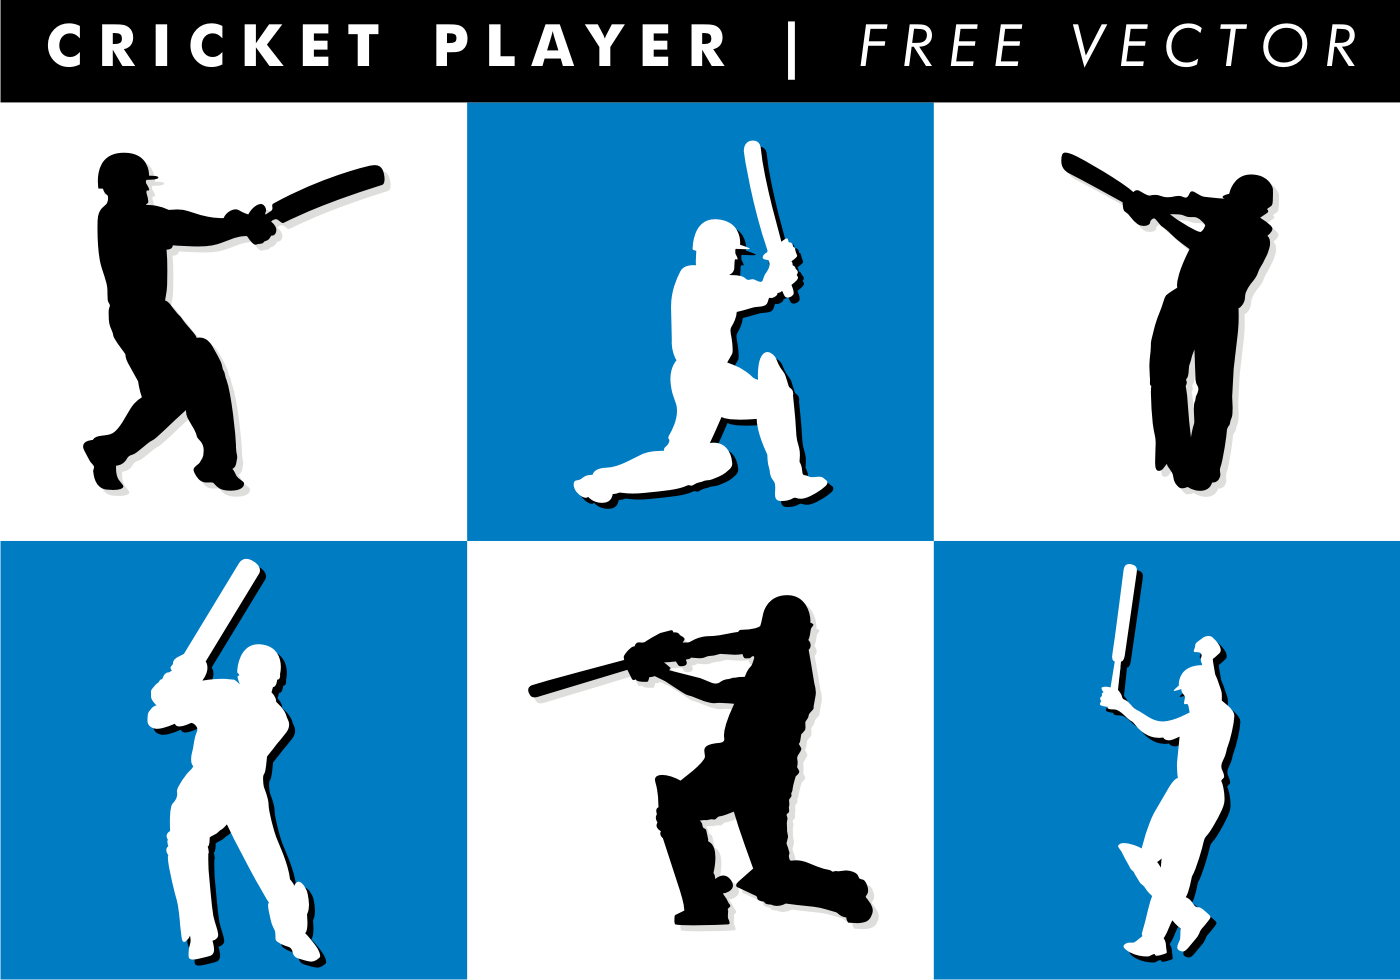 cricket player free vector download free vector art